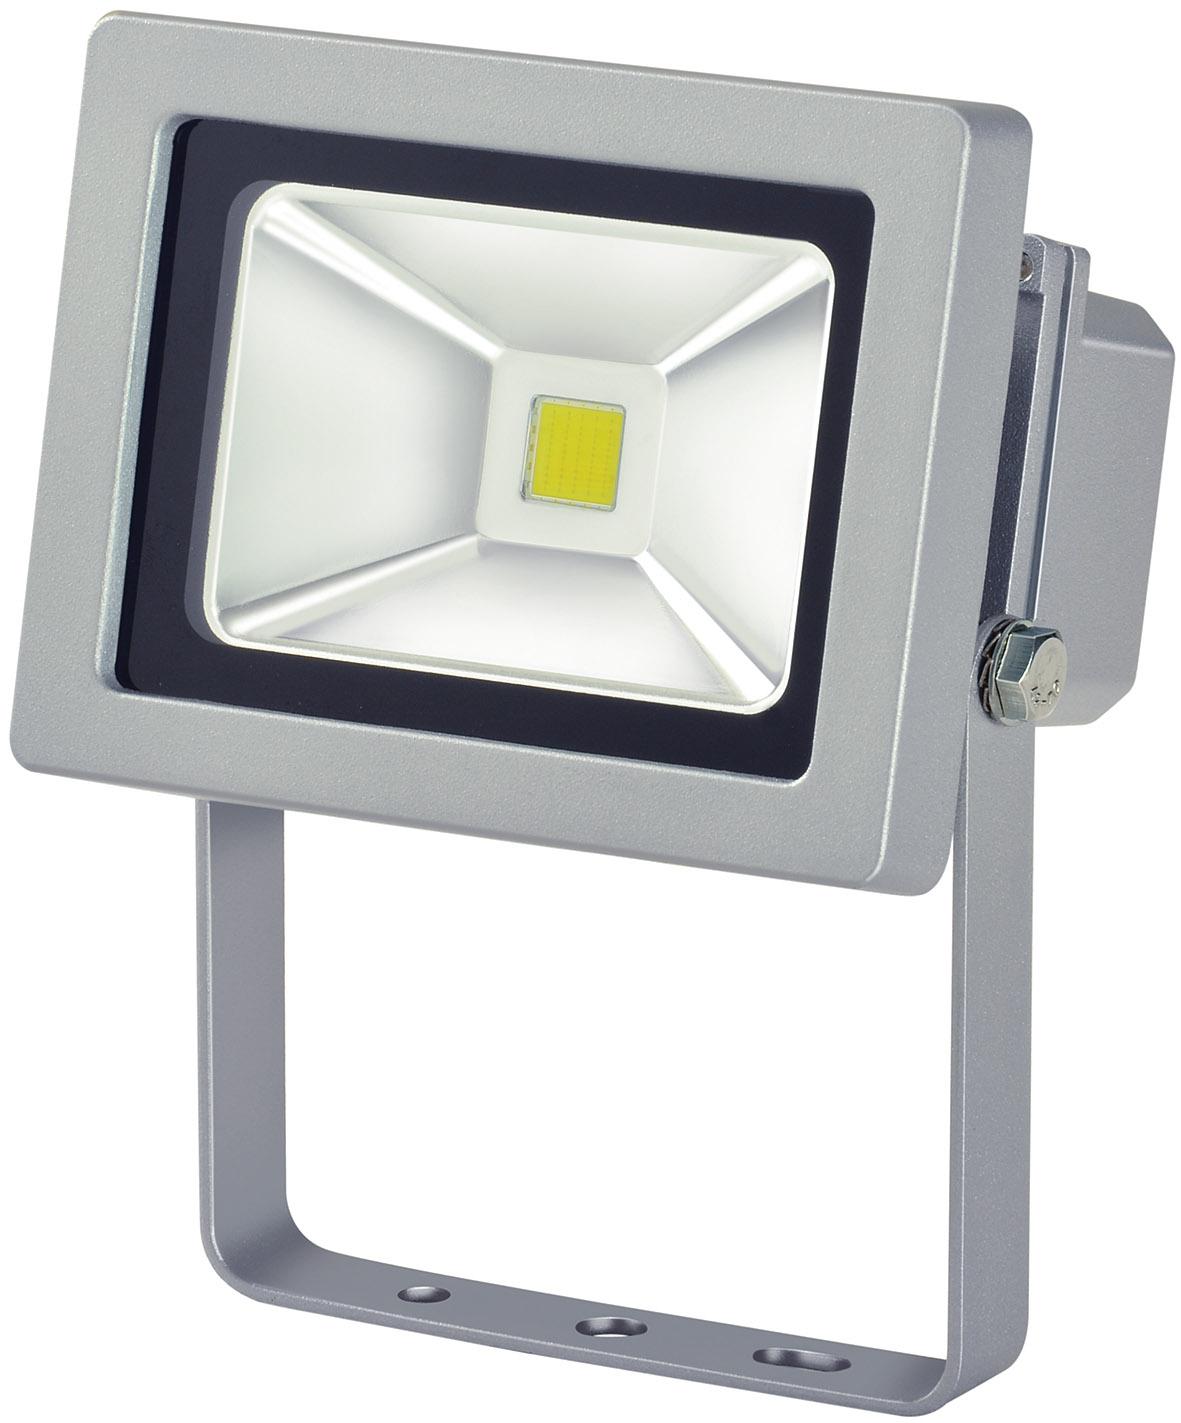 chip led leuchte l cn 110 v2 ip 65 m belbeschl ge und m beltechnik online kaufen bei k batec. Black Bedroom Furniture Sets. Home Design Ideas